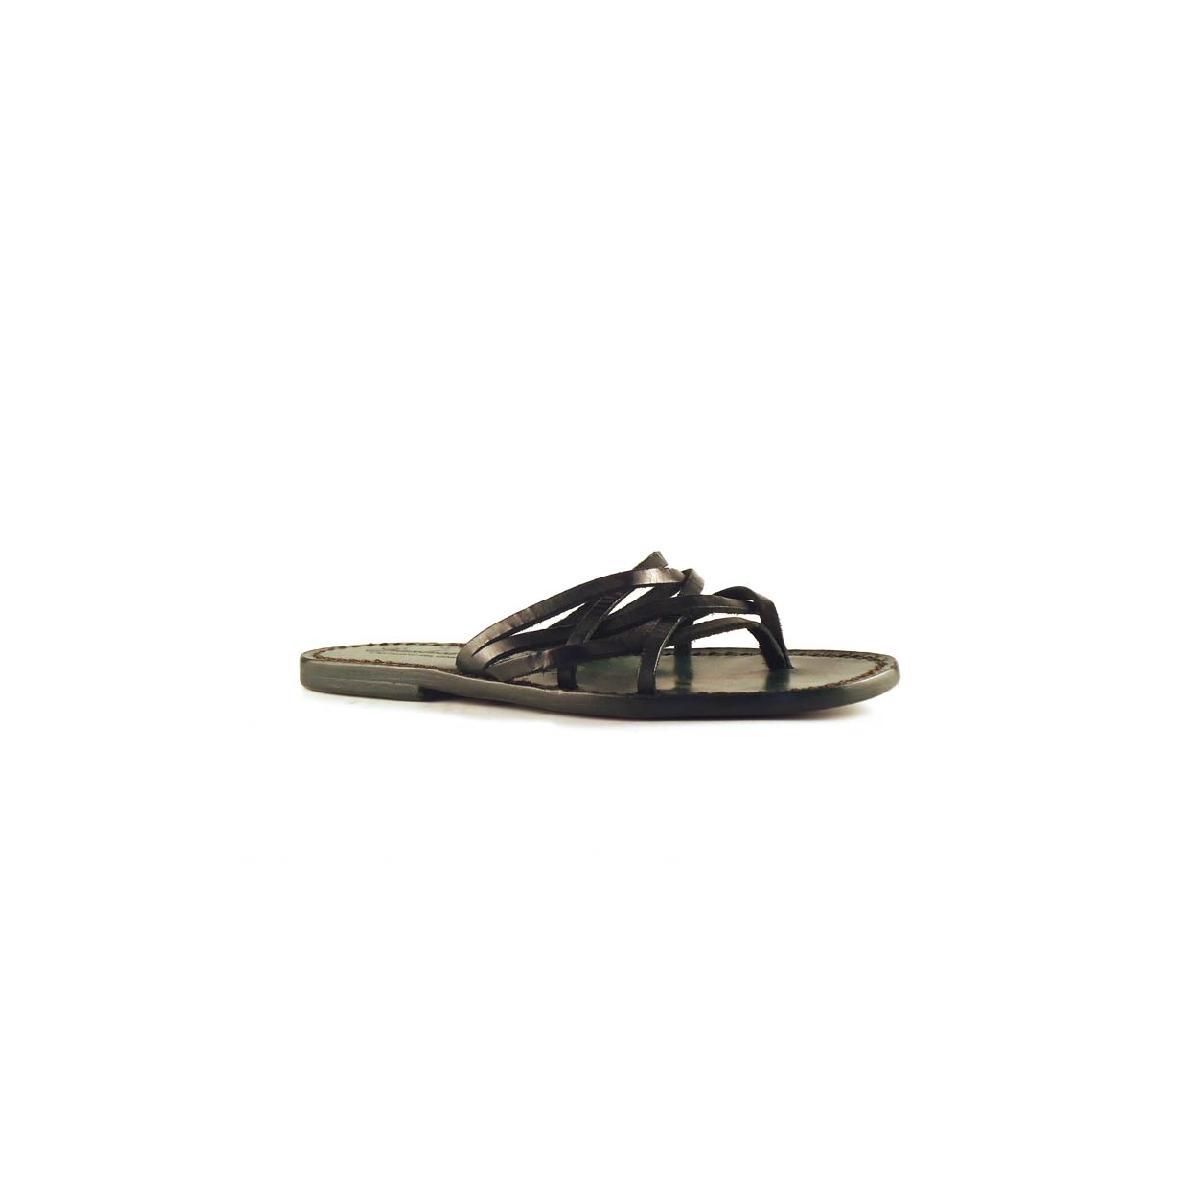 Perfect Josef Seibel Ilana Women Leather Green Slides Sandal Sandals